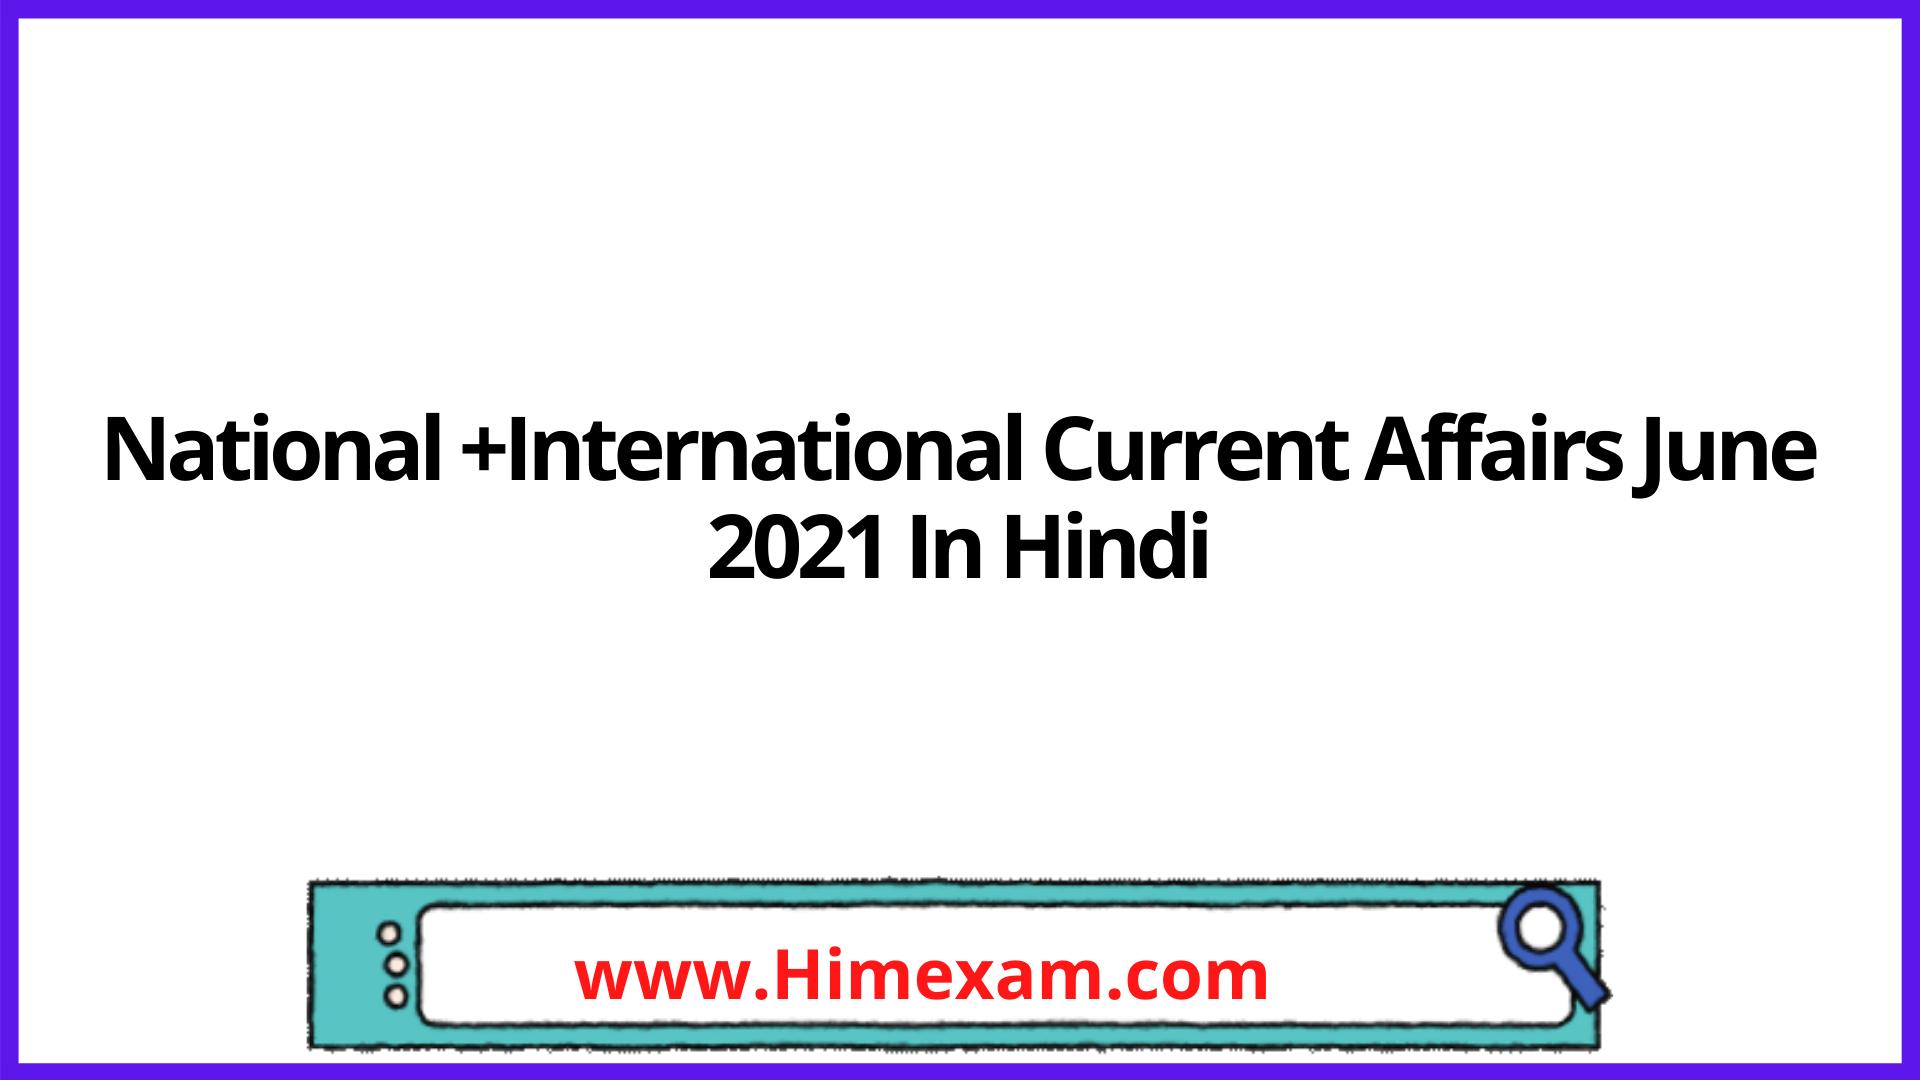 National +International Current Affairs June 2021 In Hindi